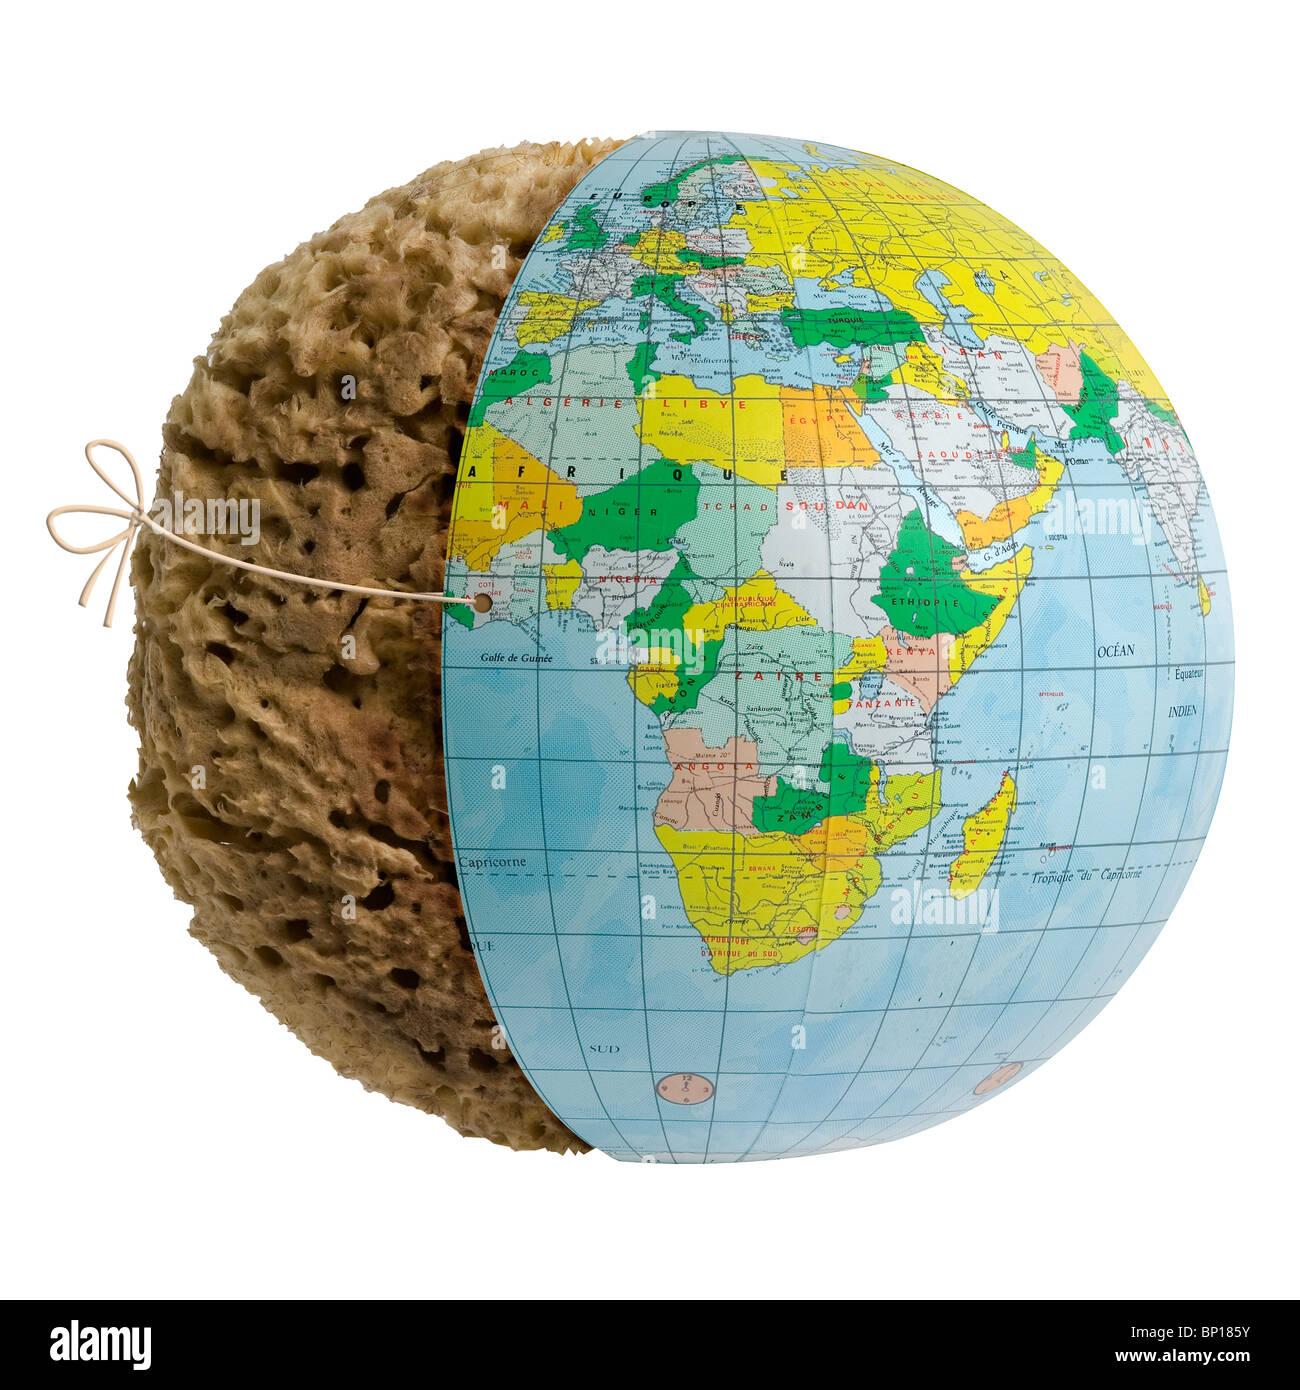 Sponge globe - Stock Image